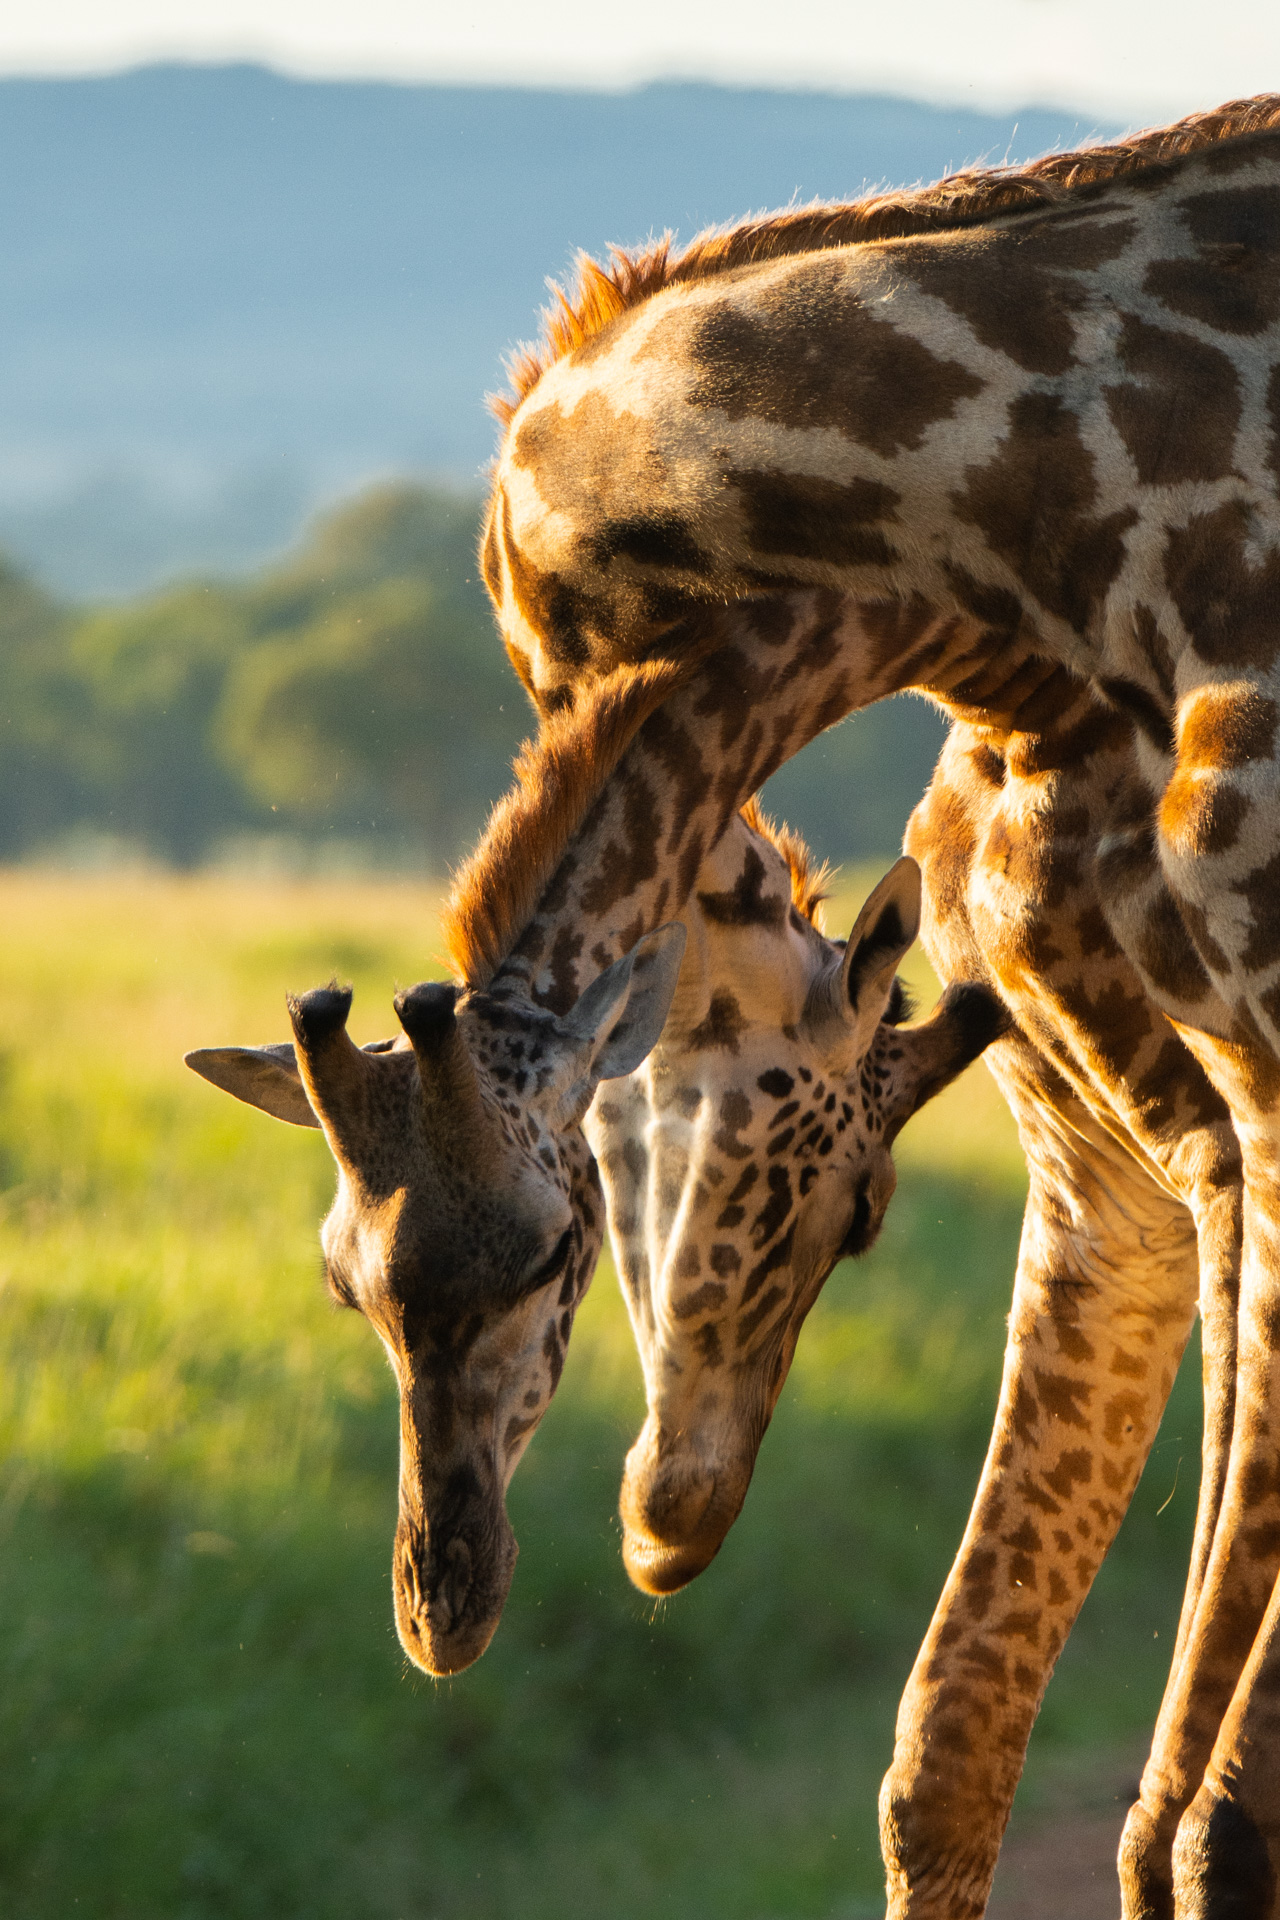 Twisted giraffe necks